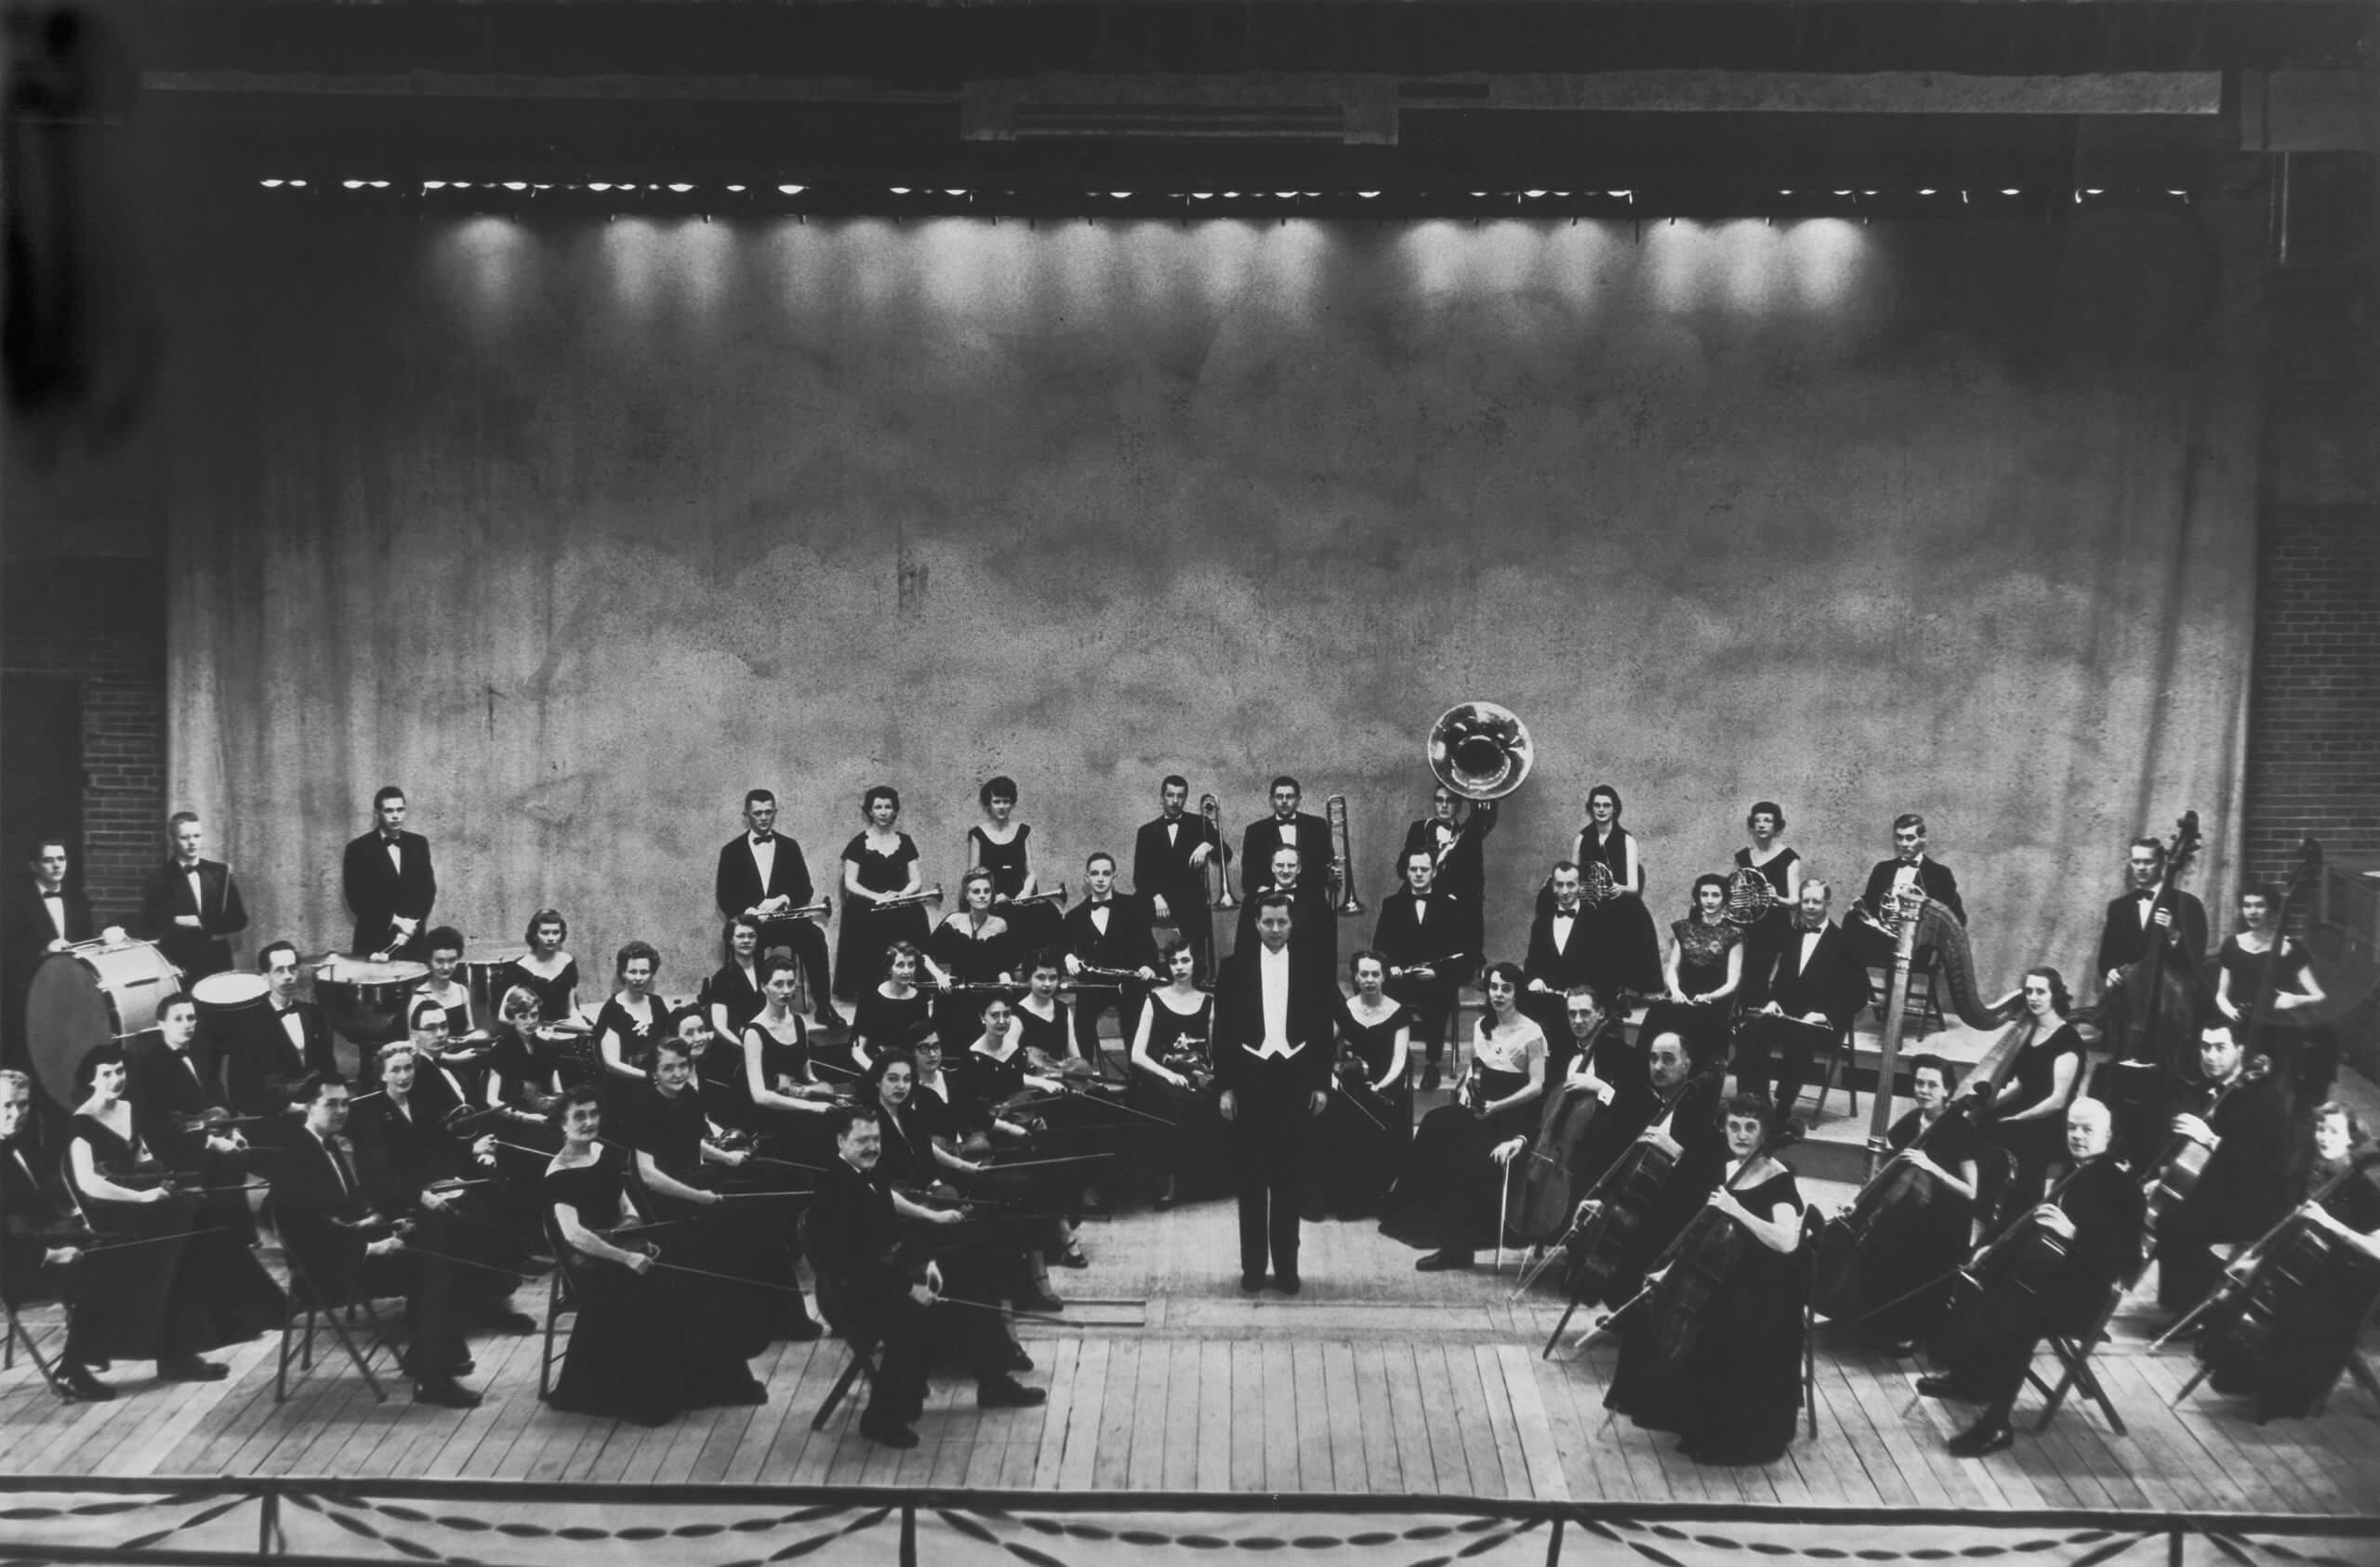 Billings Symphony circa 1951